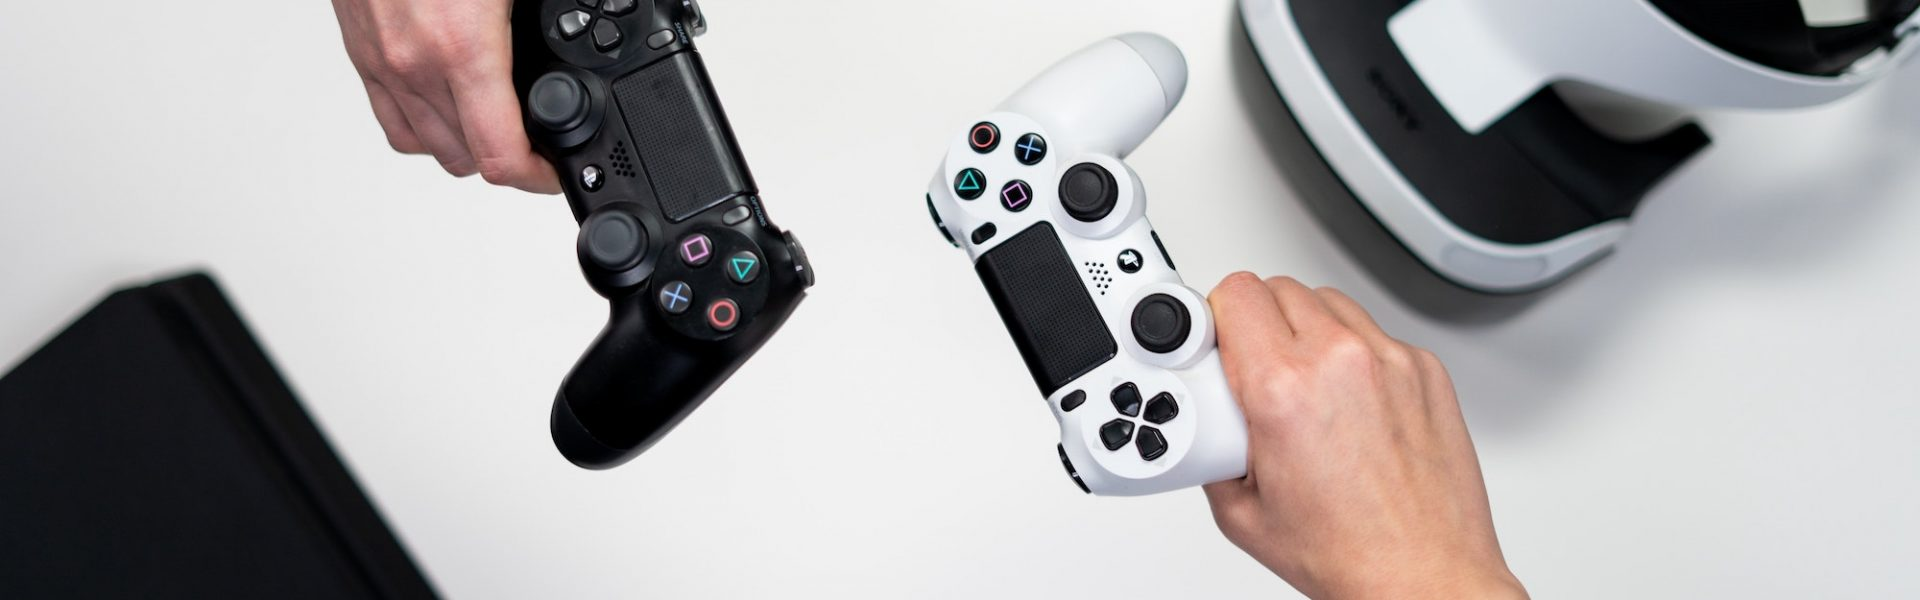 PlayStation 5 a PlayStation 4 - jakie są różnice